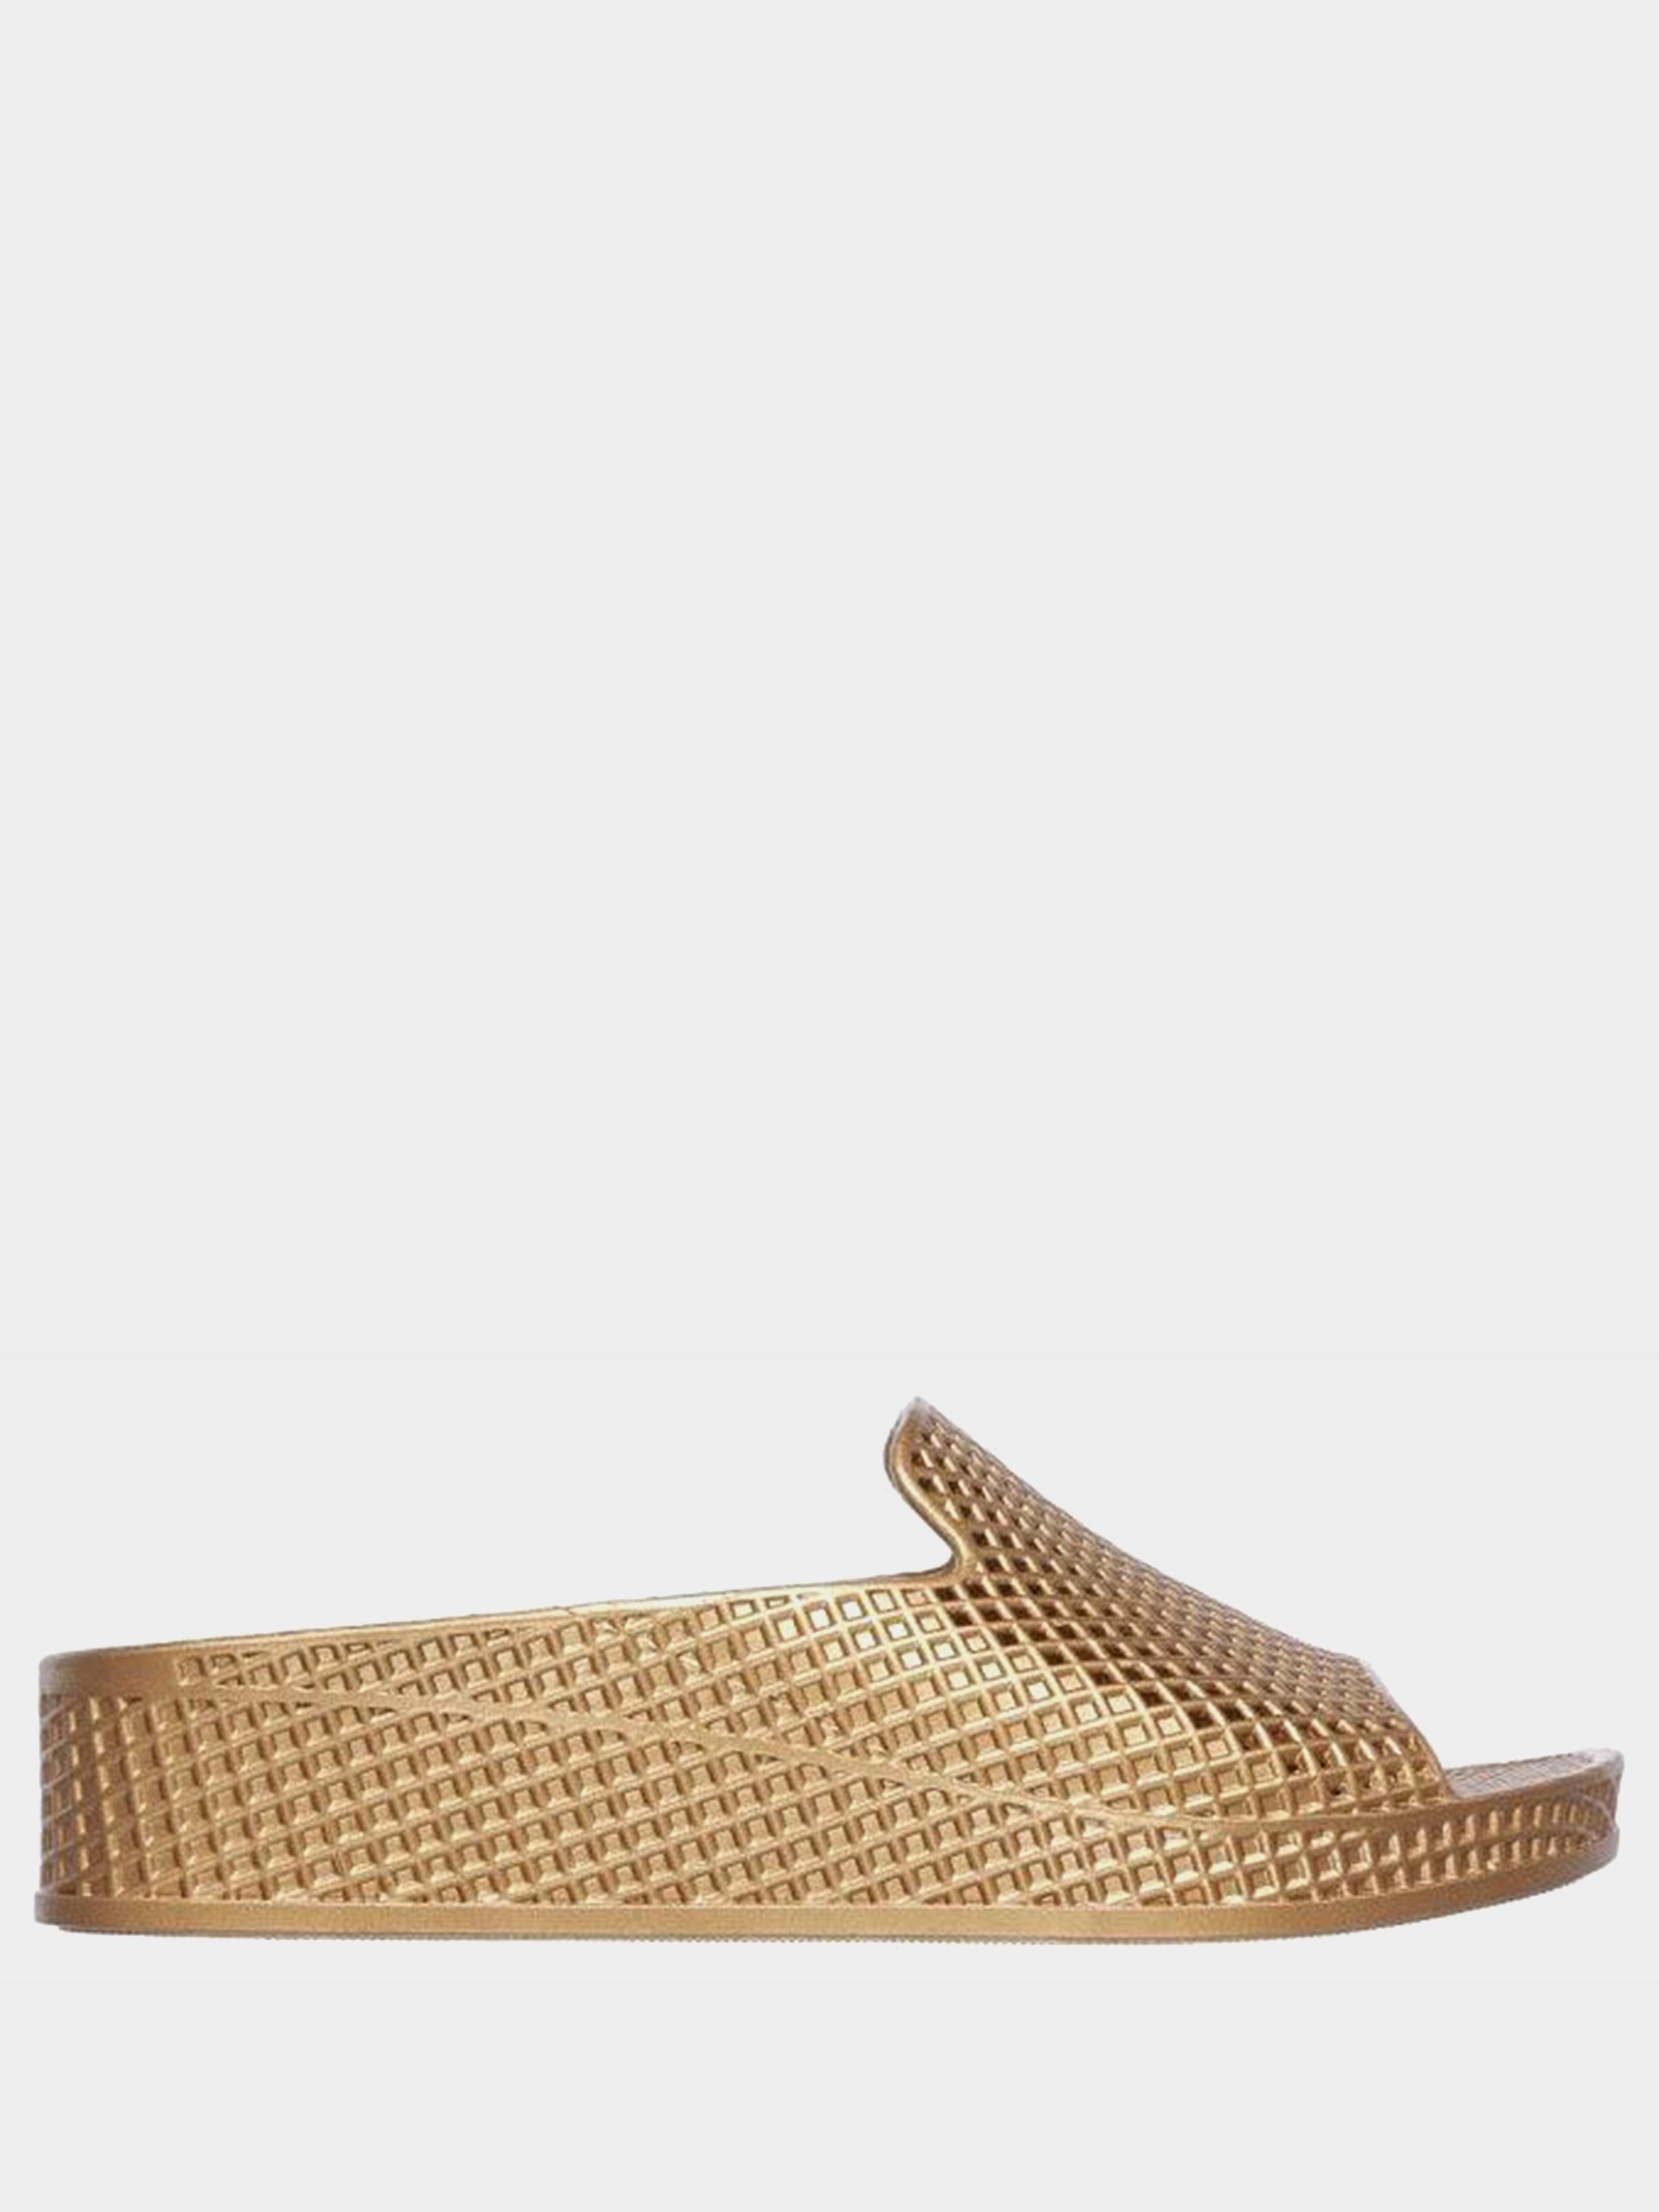 Шлёпанцы для женщин Skechers KW4539 размеры обуви, 2017